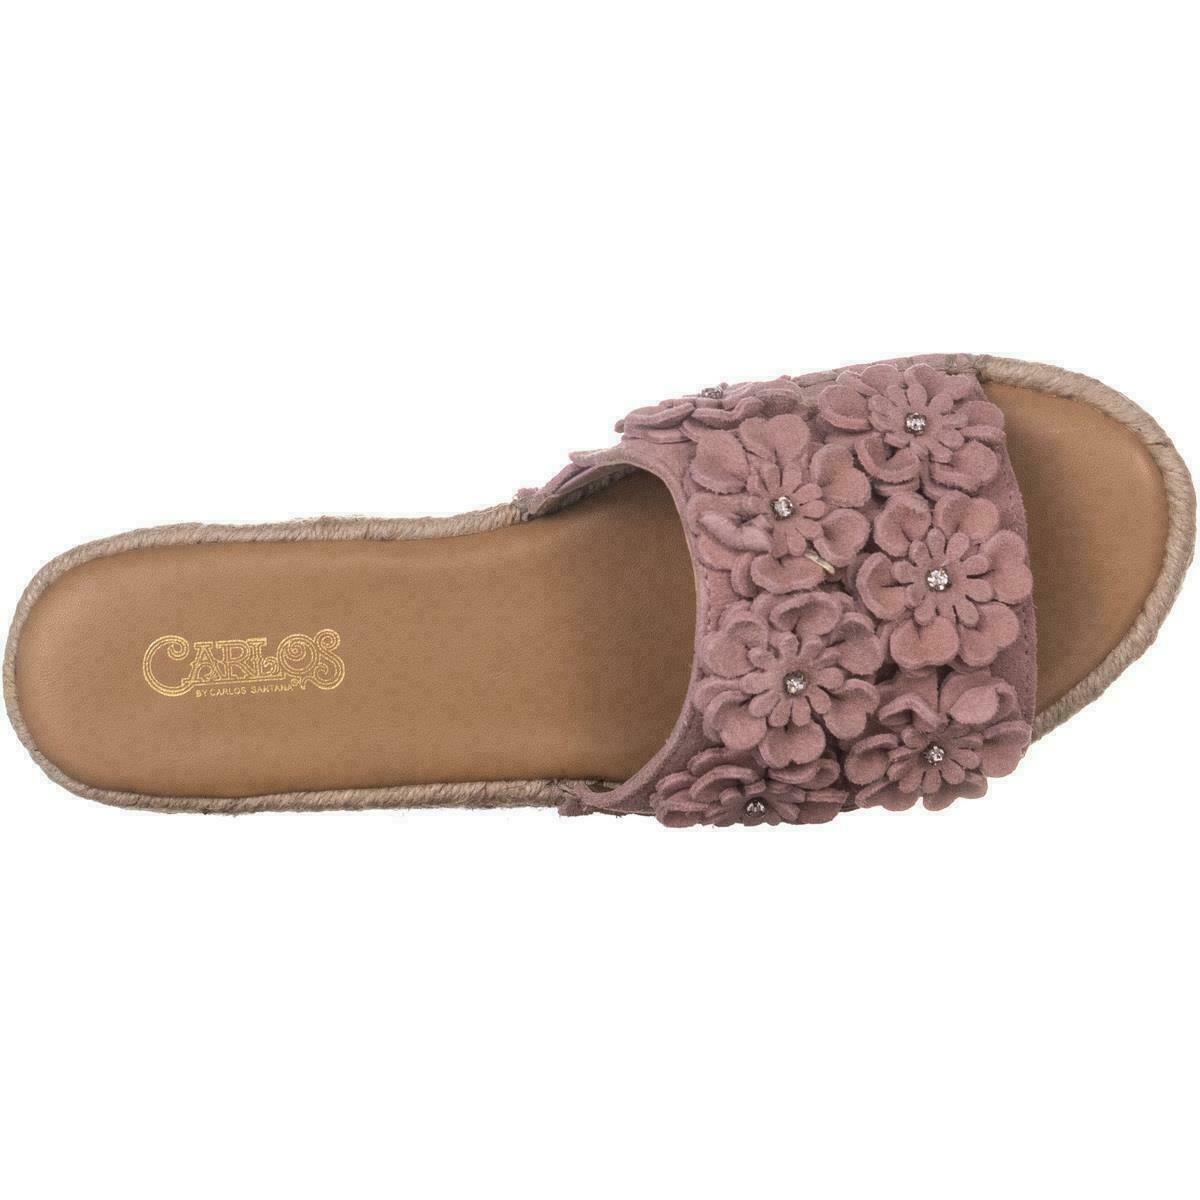 Carlos by Carlos Santana Chandler Sandals Pink Blush, Size 6.5 M